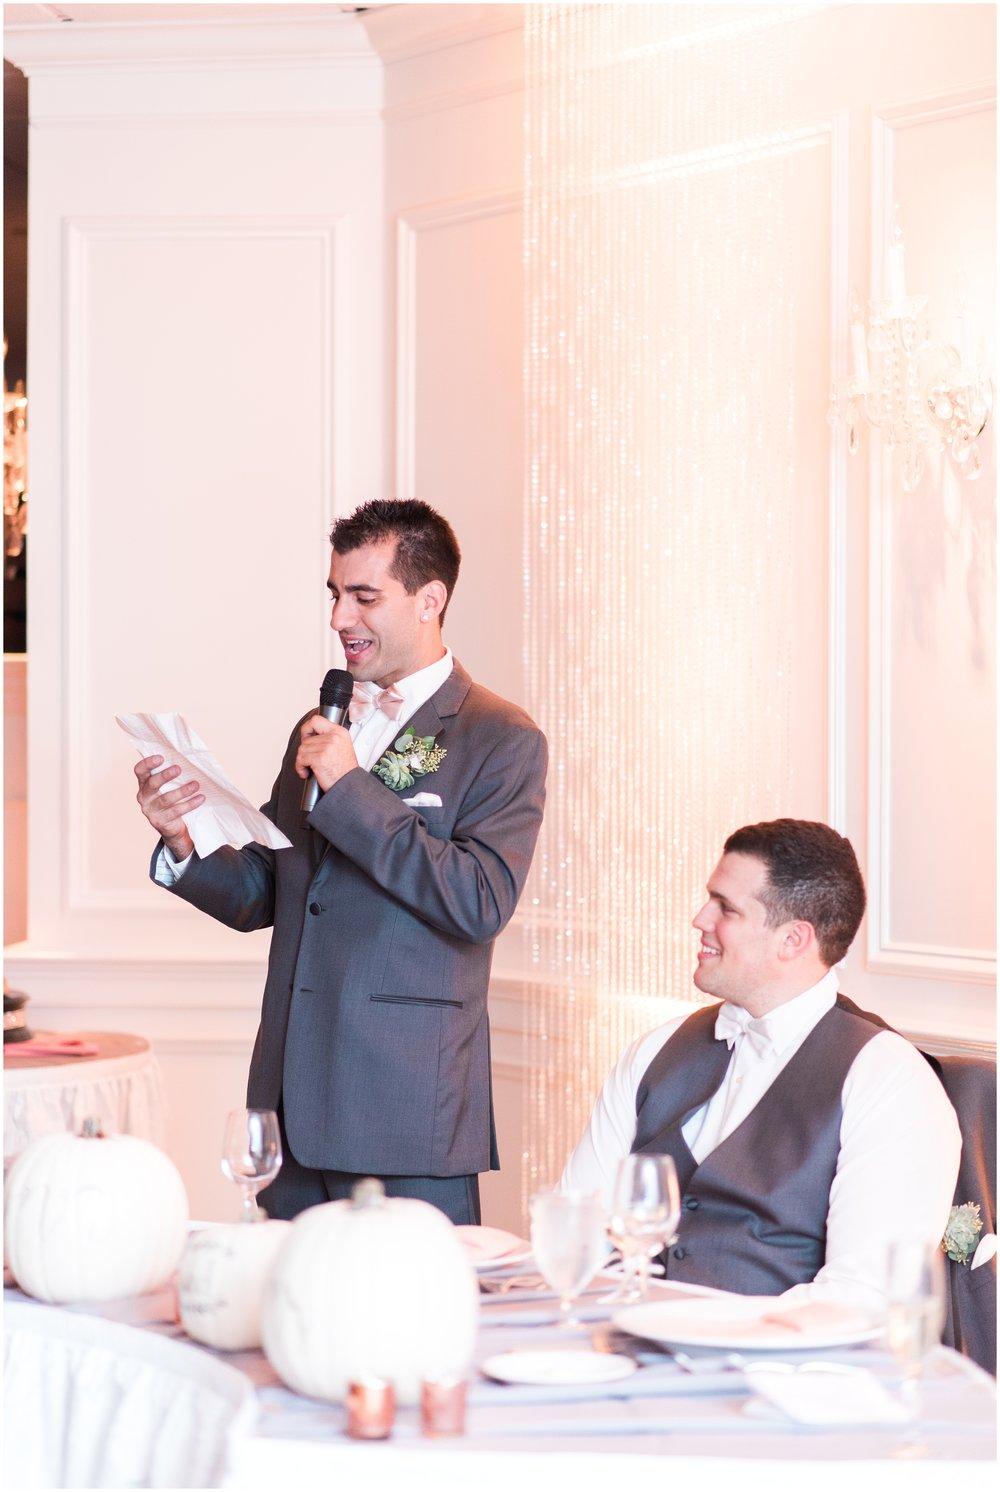 NJ-Basking-Ridge-Country-Club-Wedding-Fall-Photo_0148.jpg